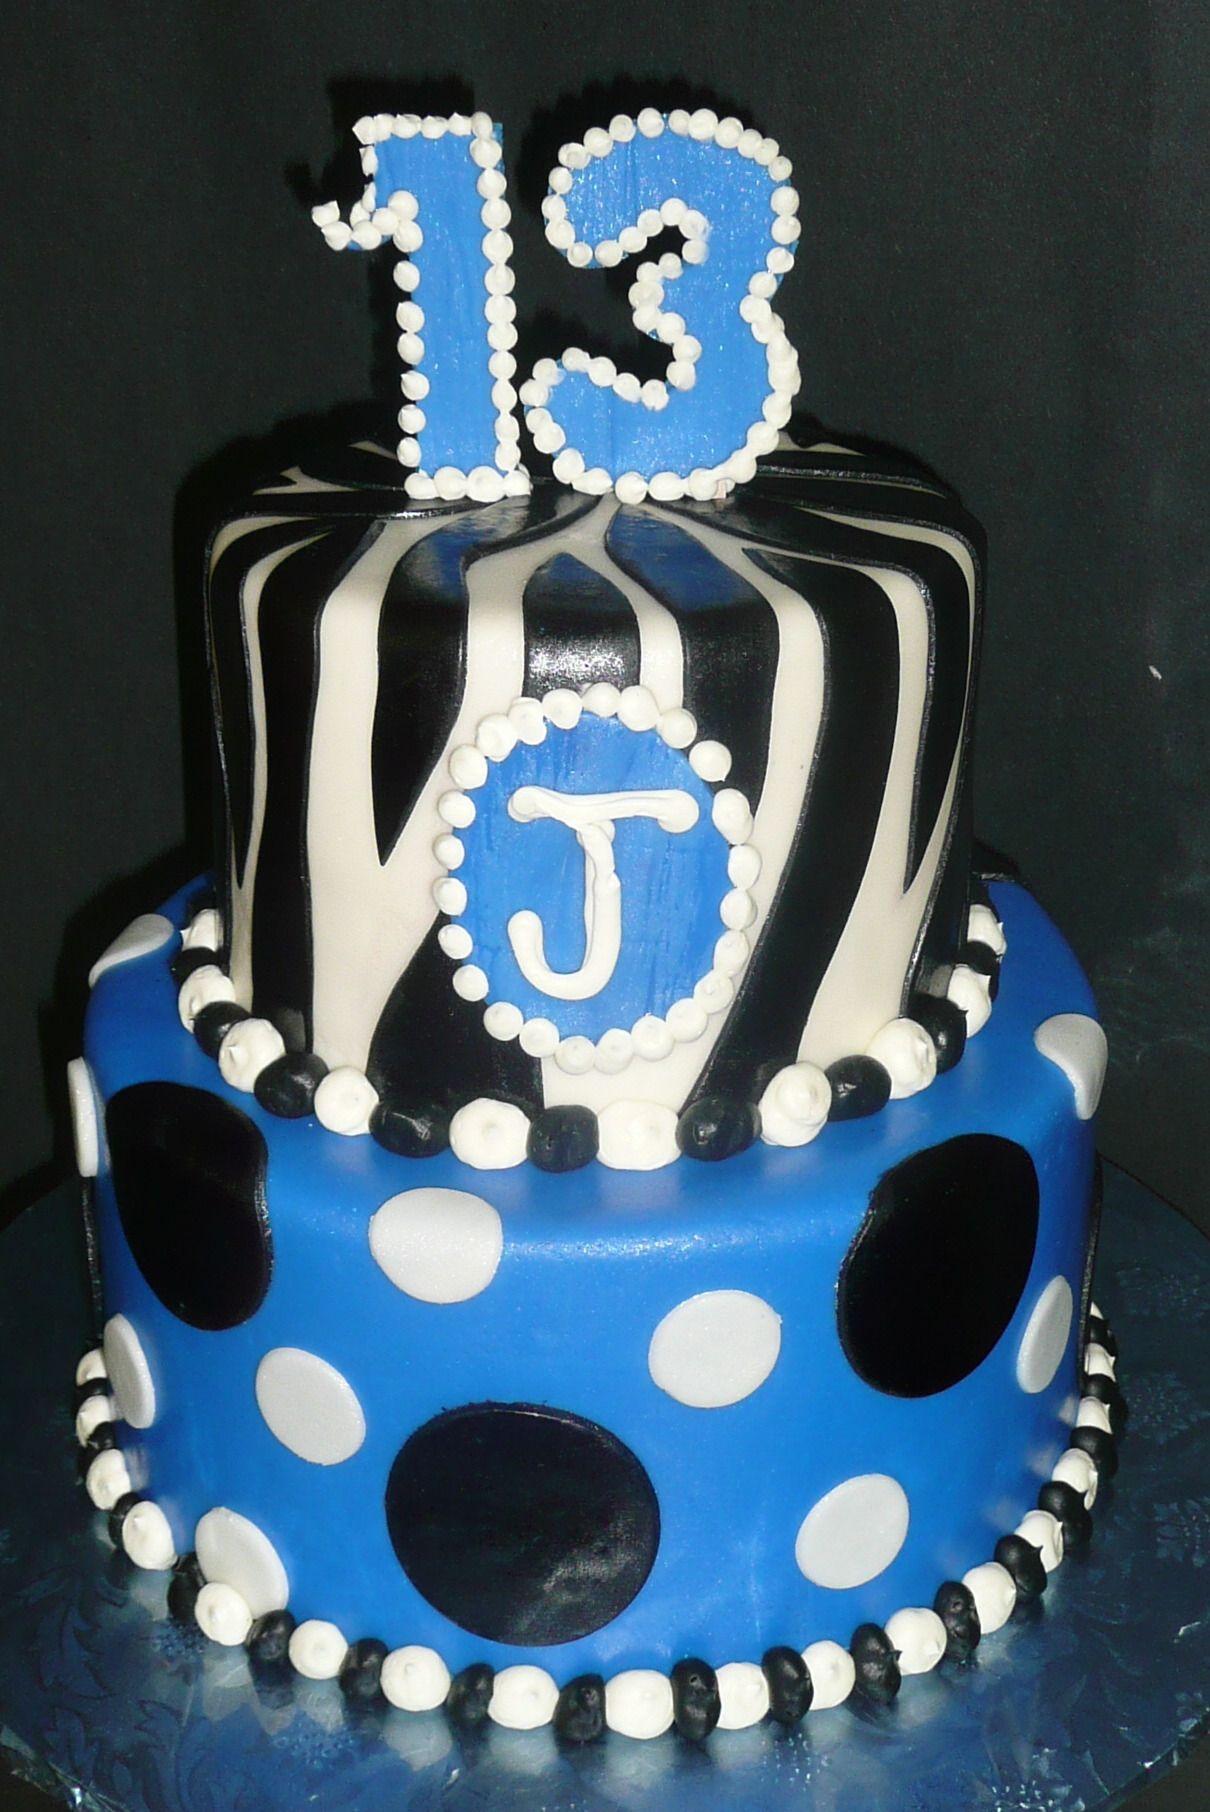 Cake Ideas For 13th Birthday Boy : Fun Polka Dot and Zebra 13th Birthday Cake Happy ...